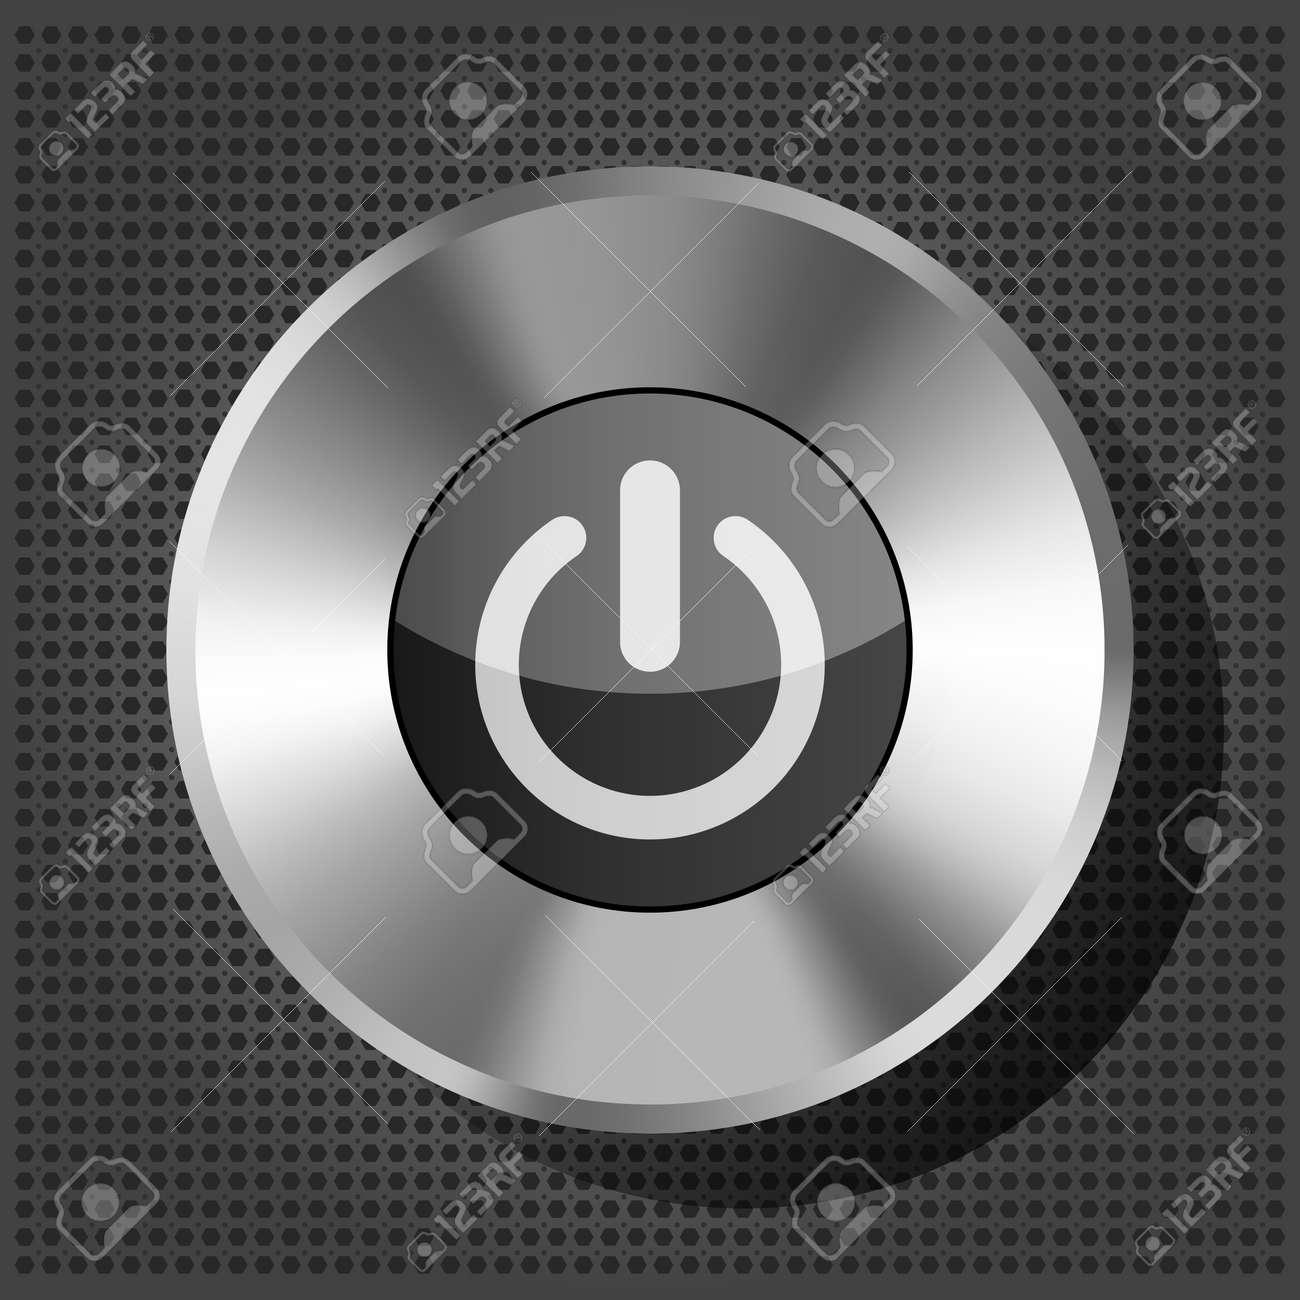 power button icon on the metallic background Stock Vector - 16132681